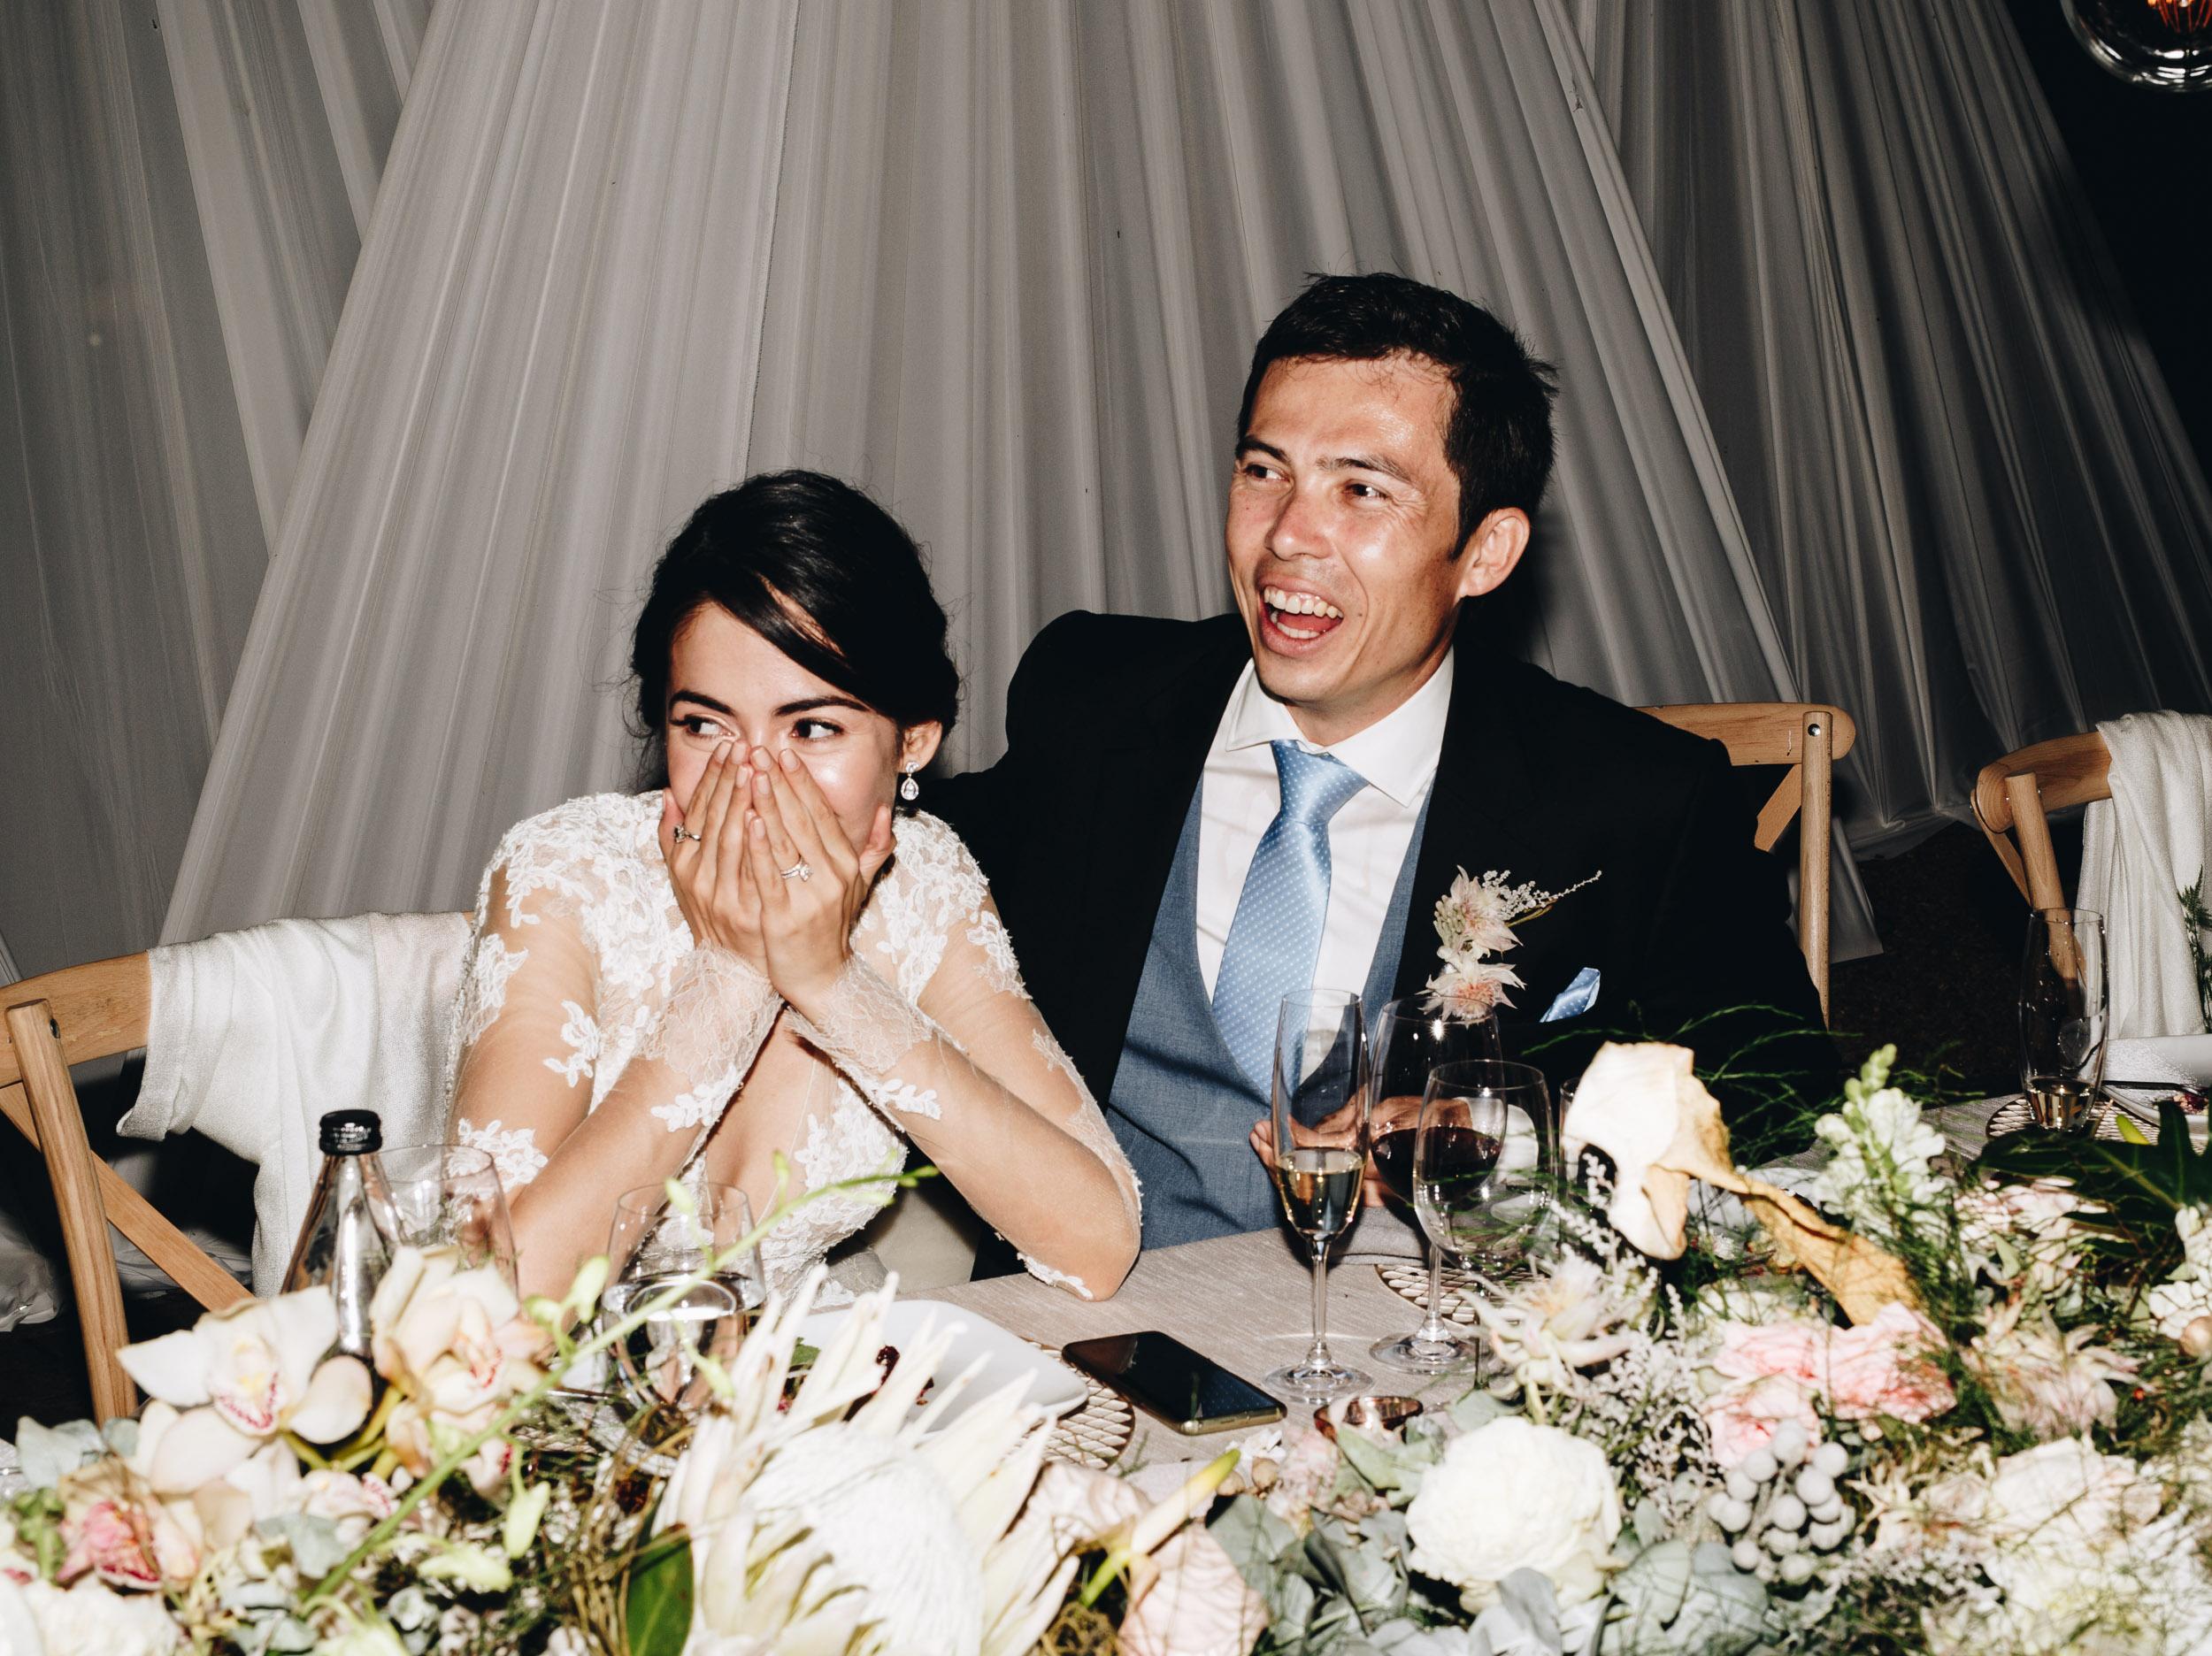 Jenny-Rockett-John-Scranton-Cape-Town-Wedding-Photographer-Andrea-Kellan-222.jpg